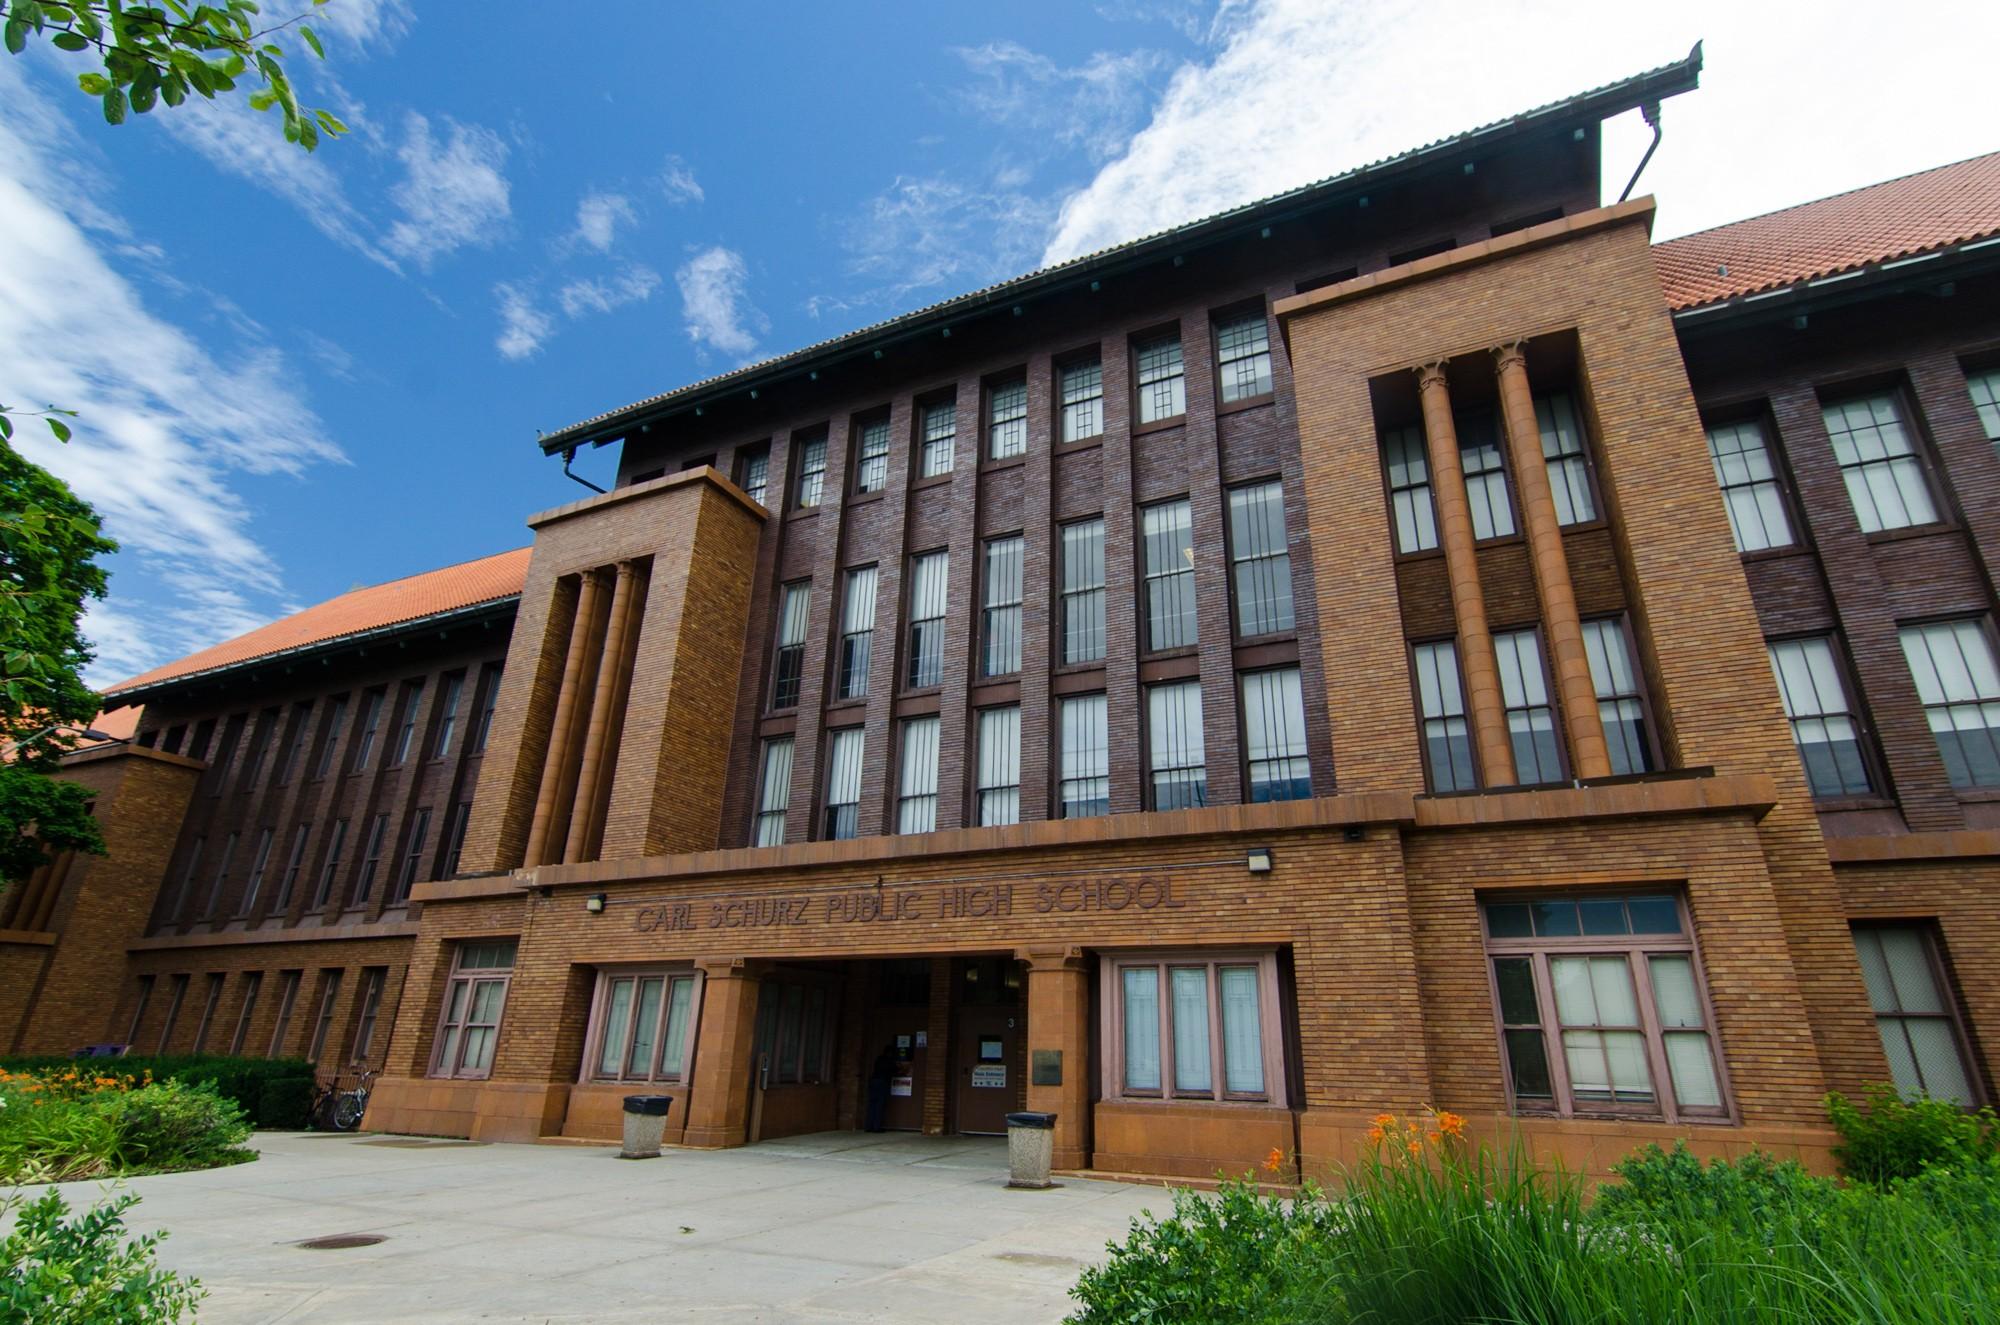 Carl Schurz High School 183 Sites 183 Open House Chicago